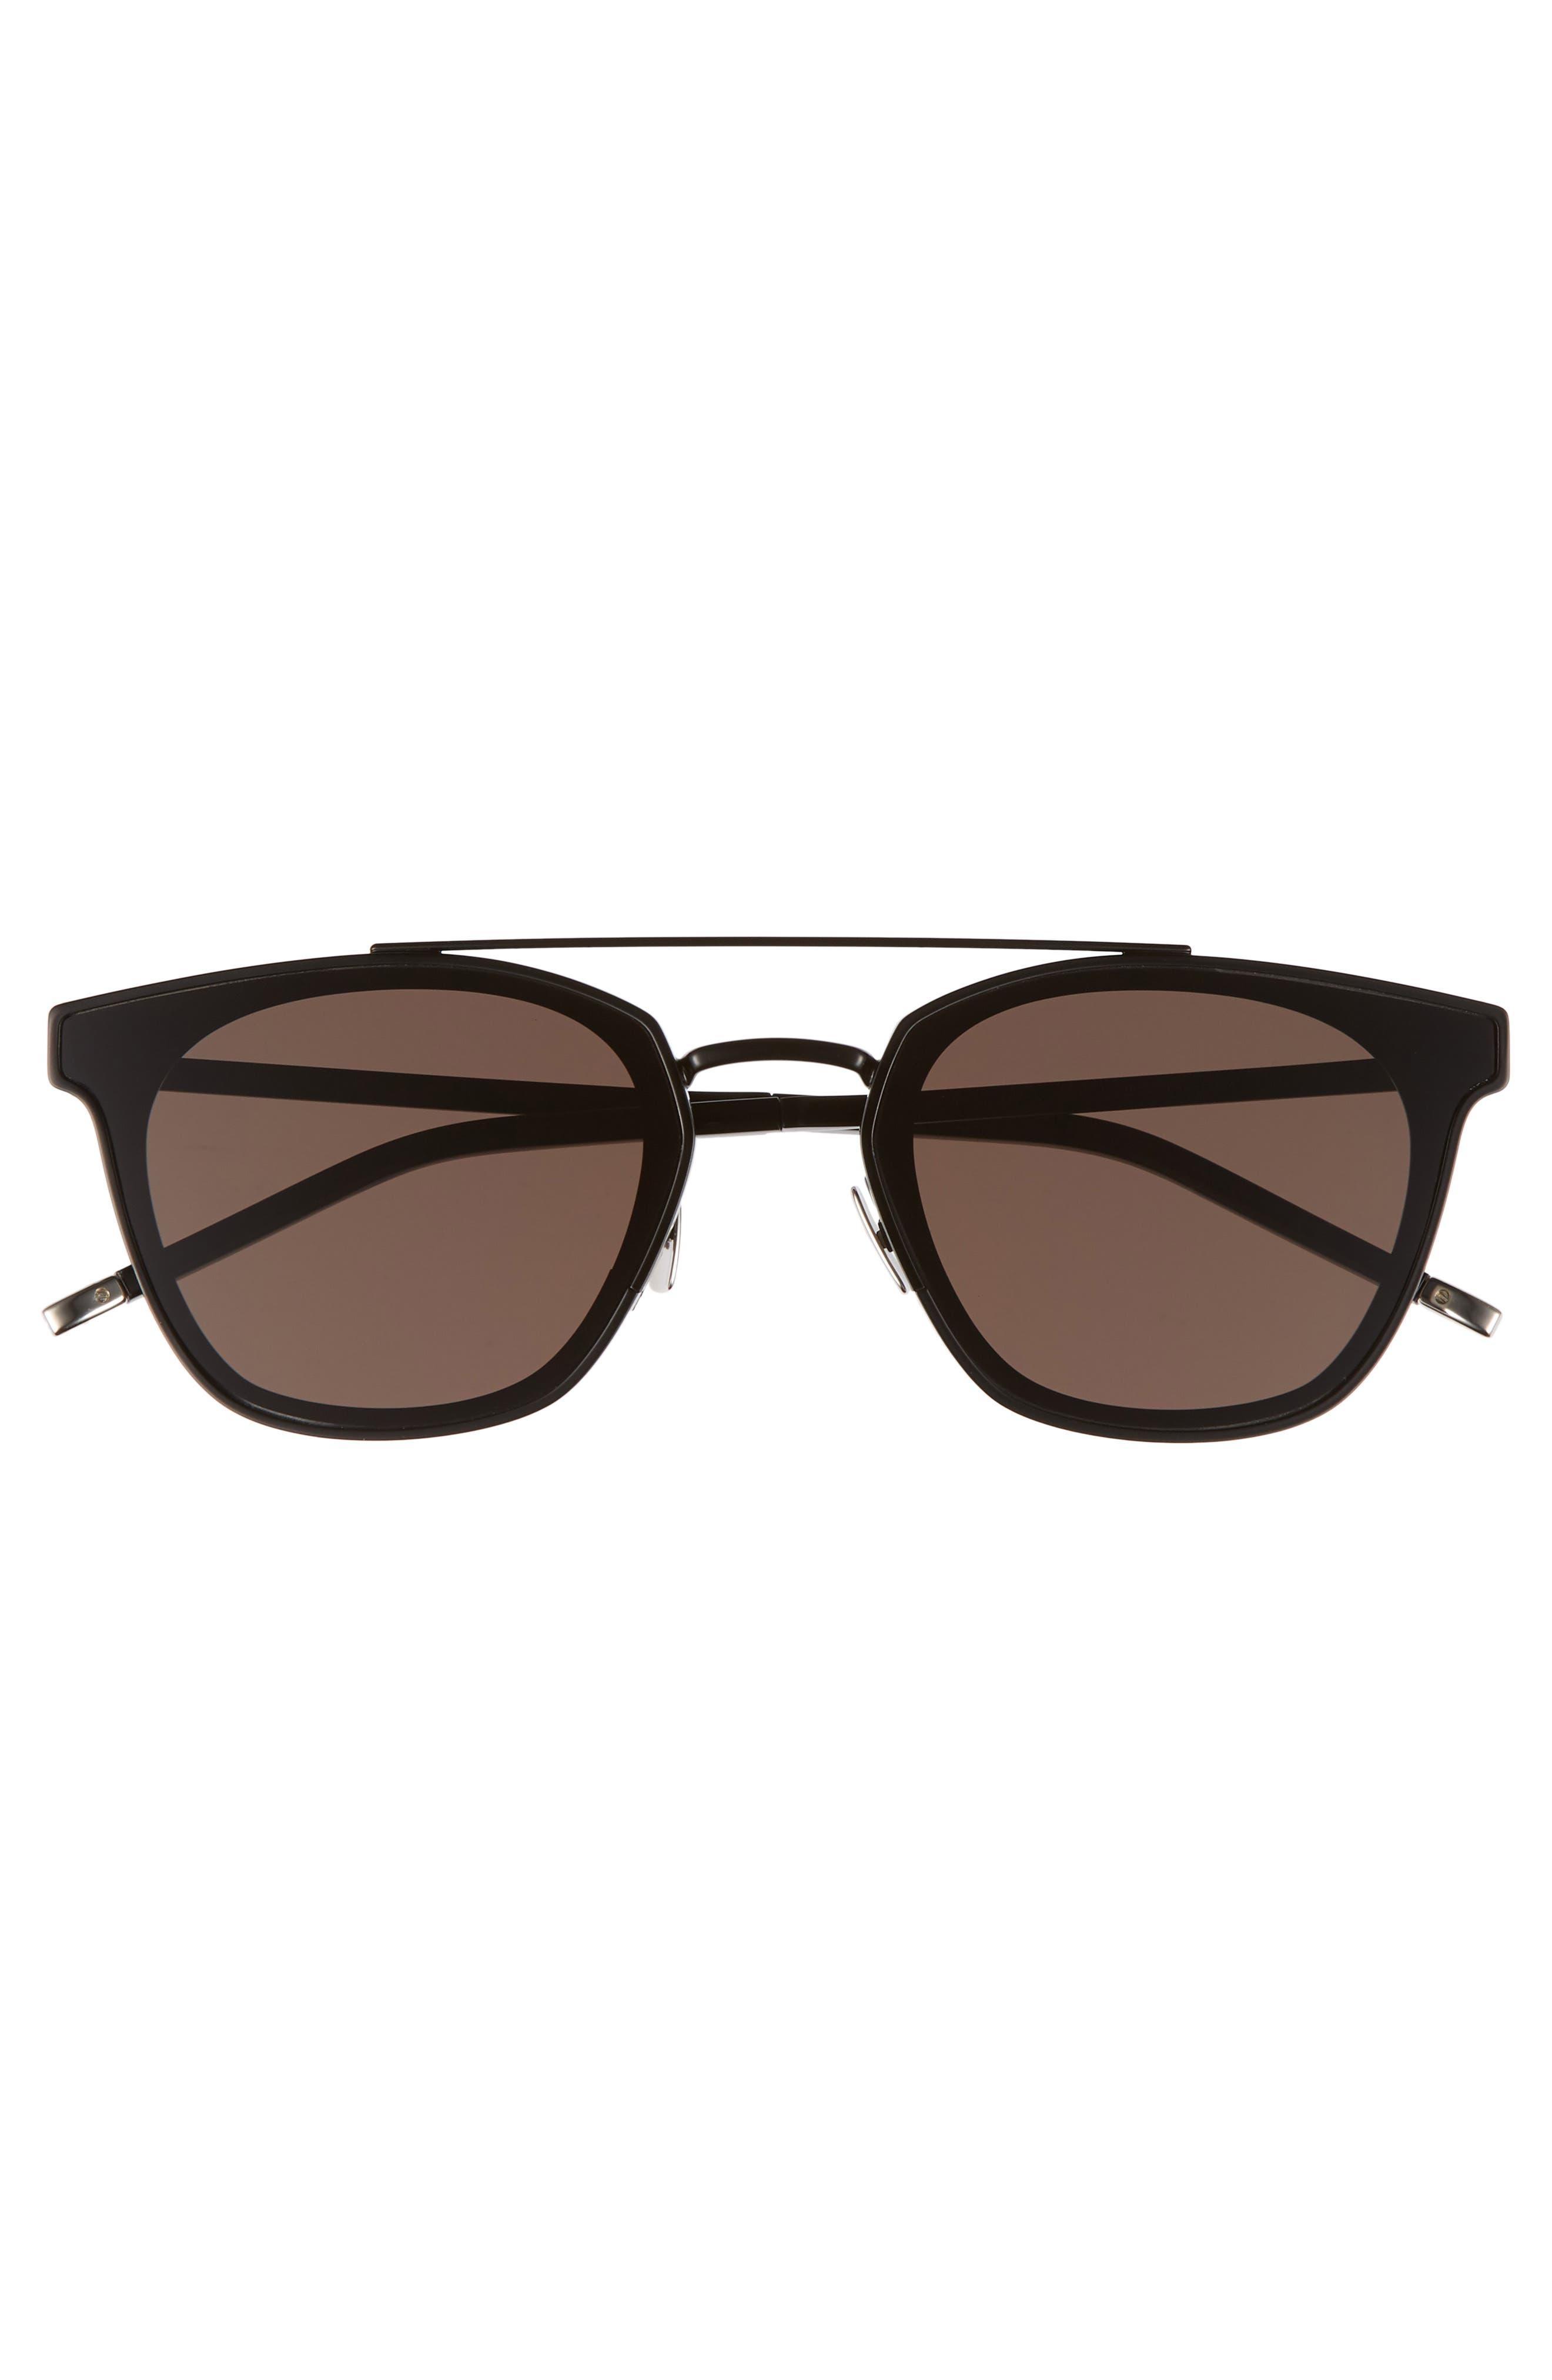 Alternate Image 2  - Saint Laurent SL 28 61mm Polarized Sunglasses